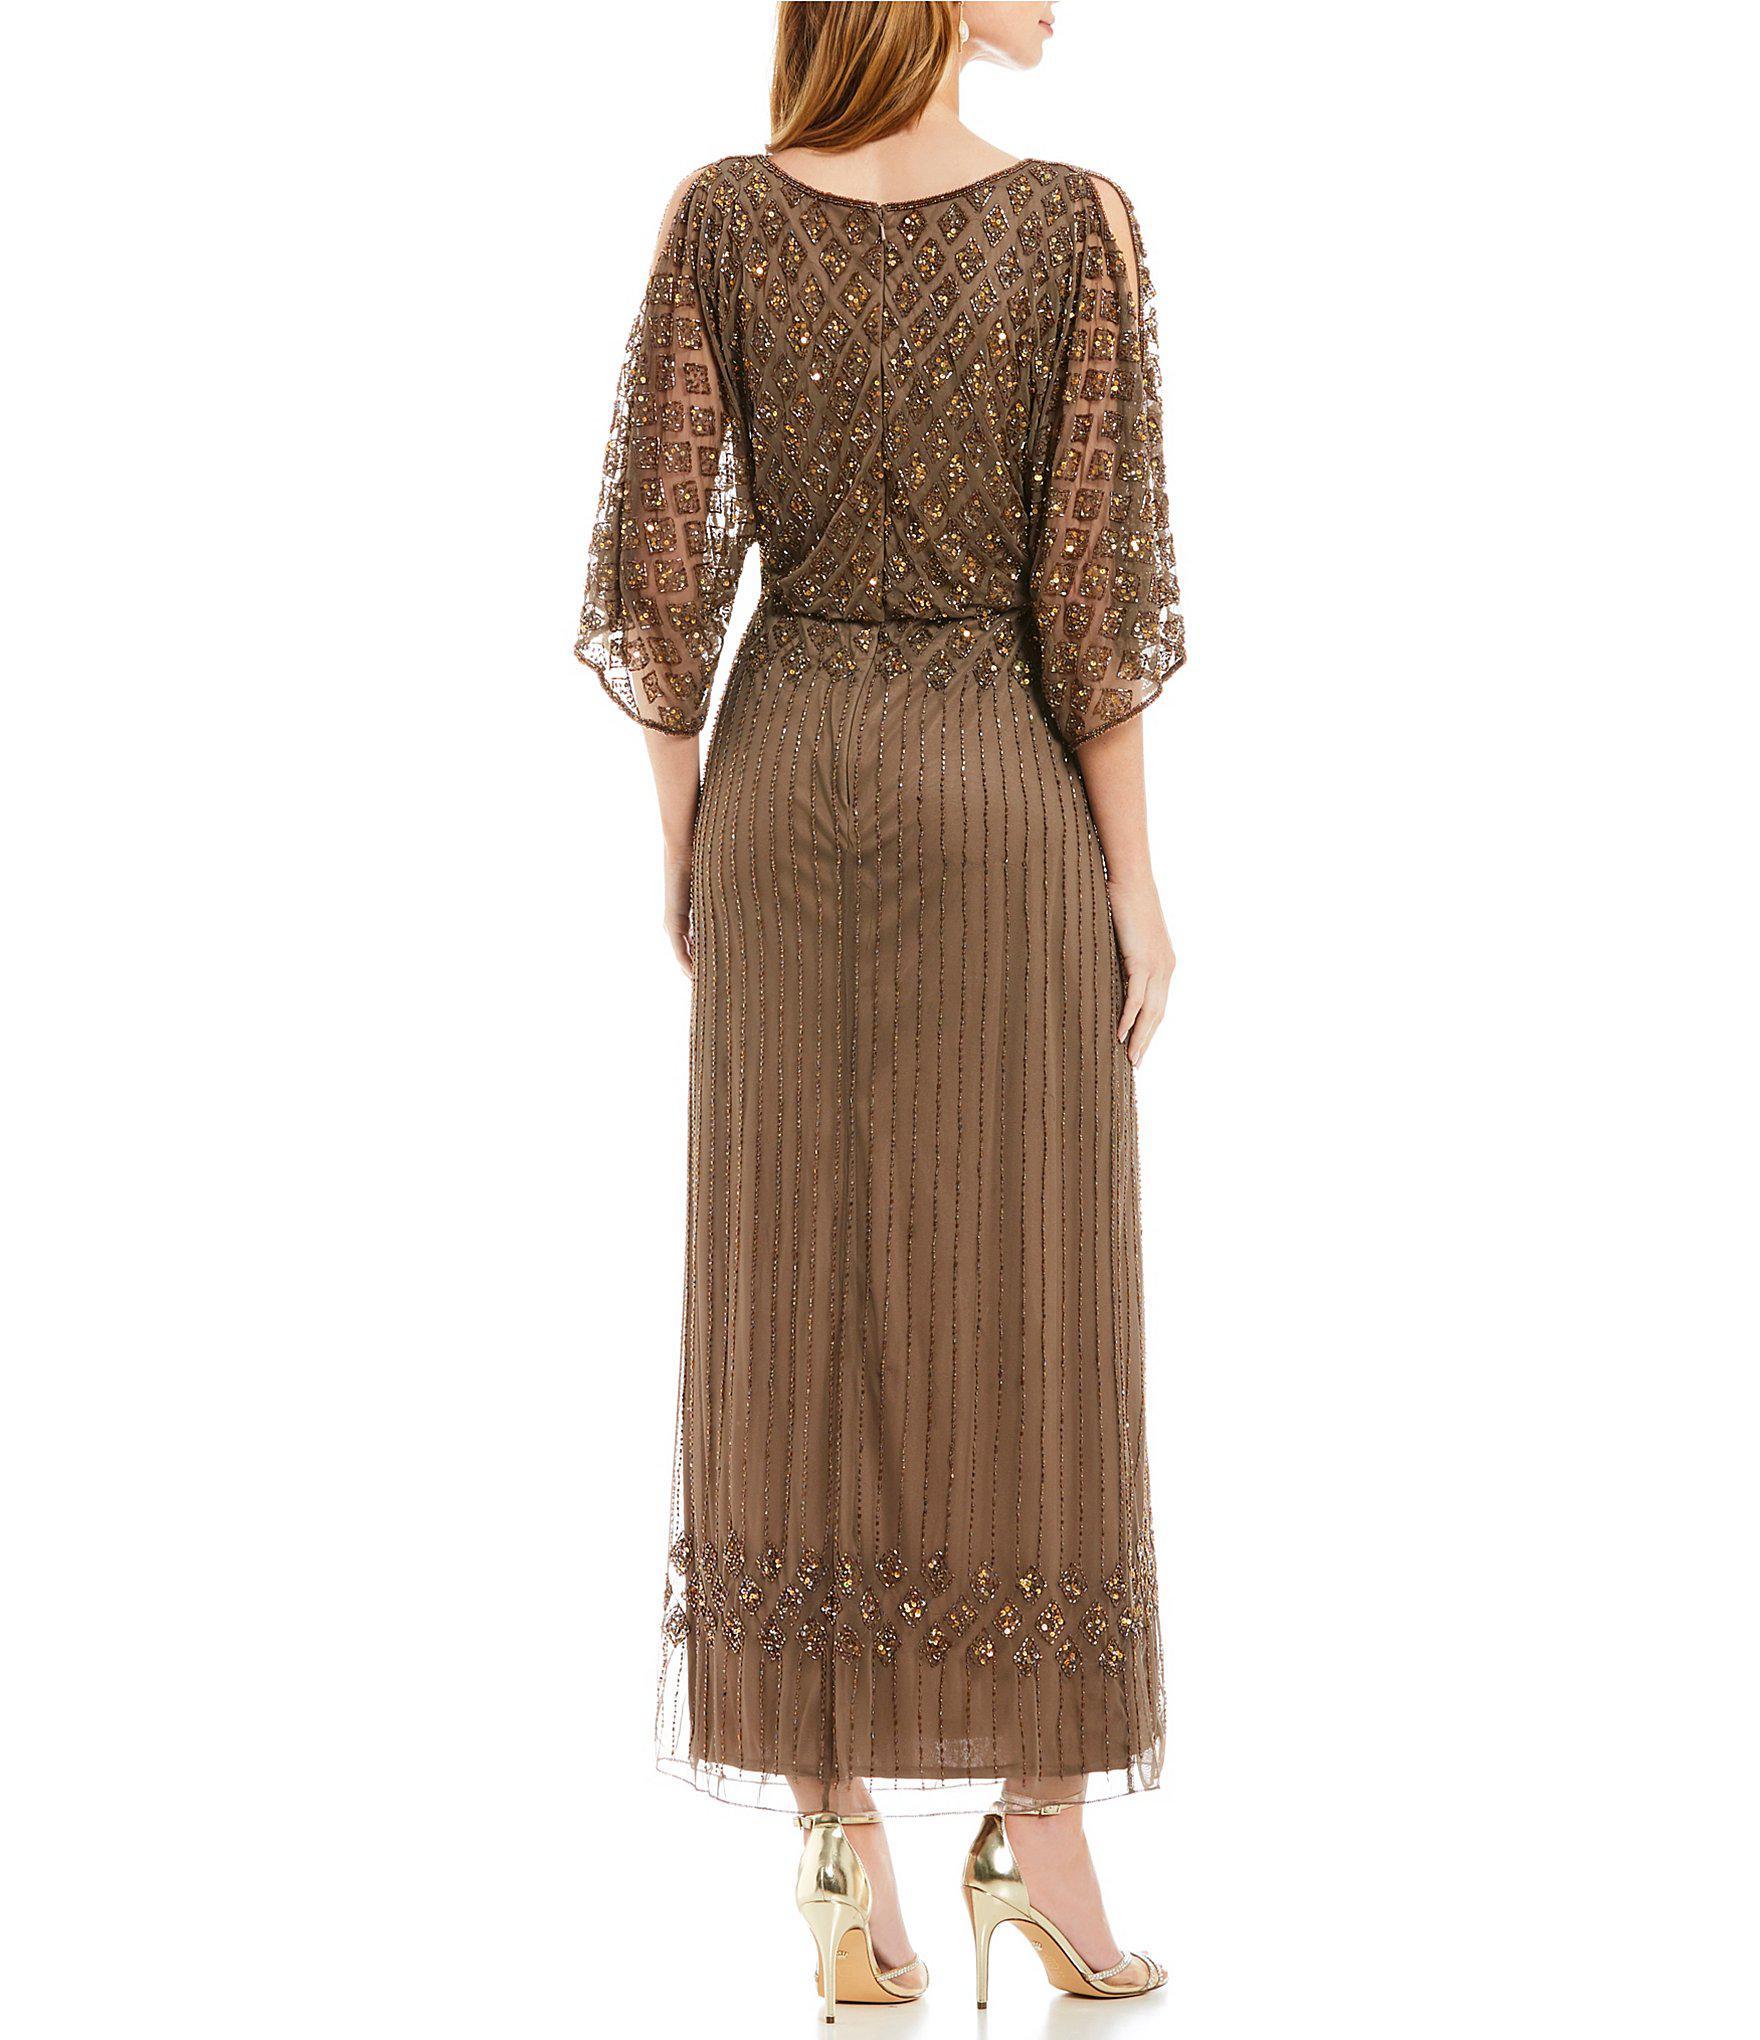 a21a67ced5b Pisarro Nights - Brown Beaded Bodice Blouson Gown - Lyst. View fullscreen